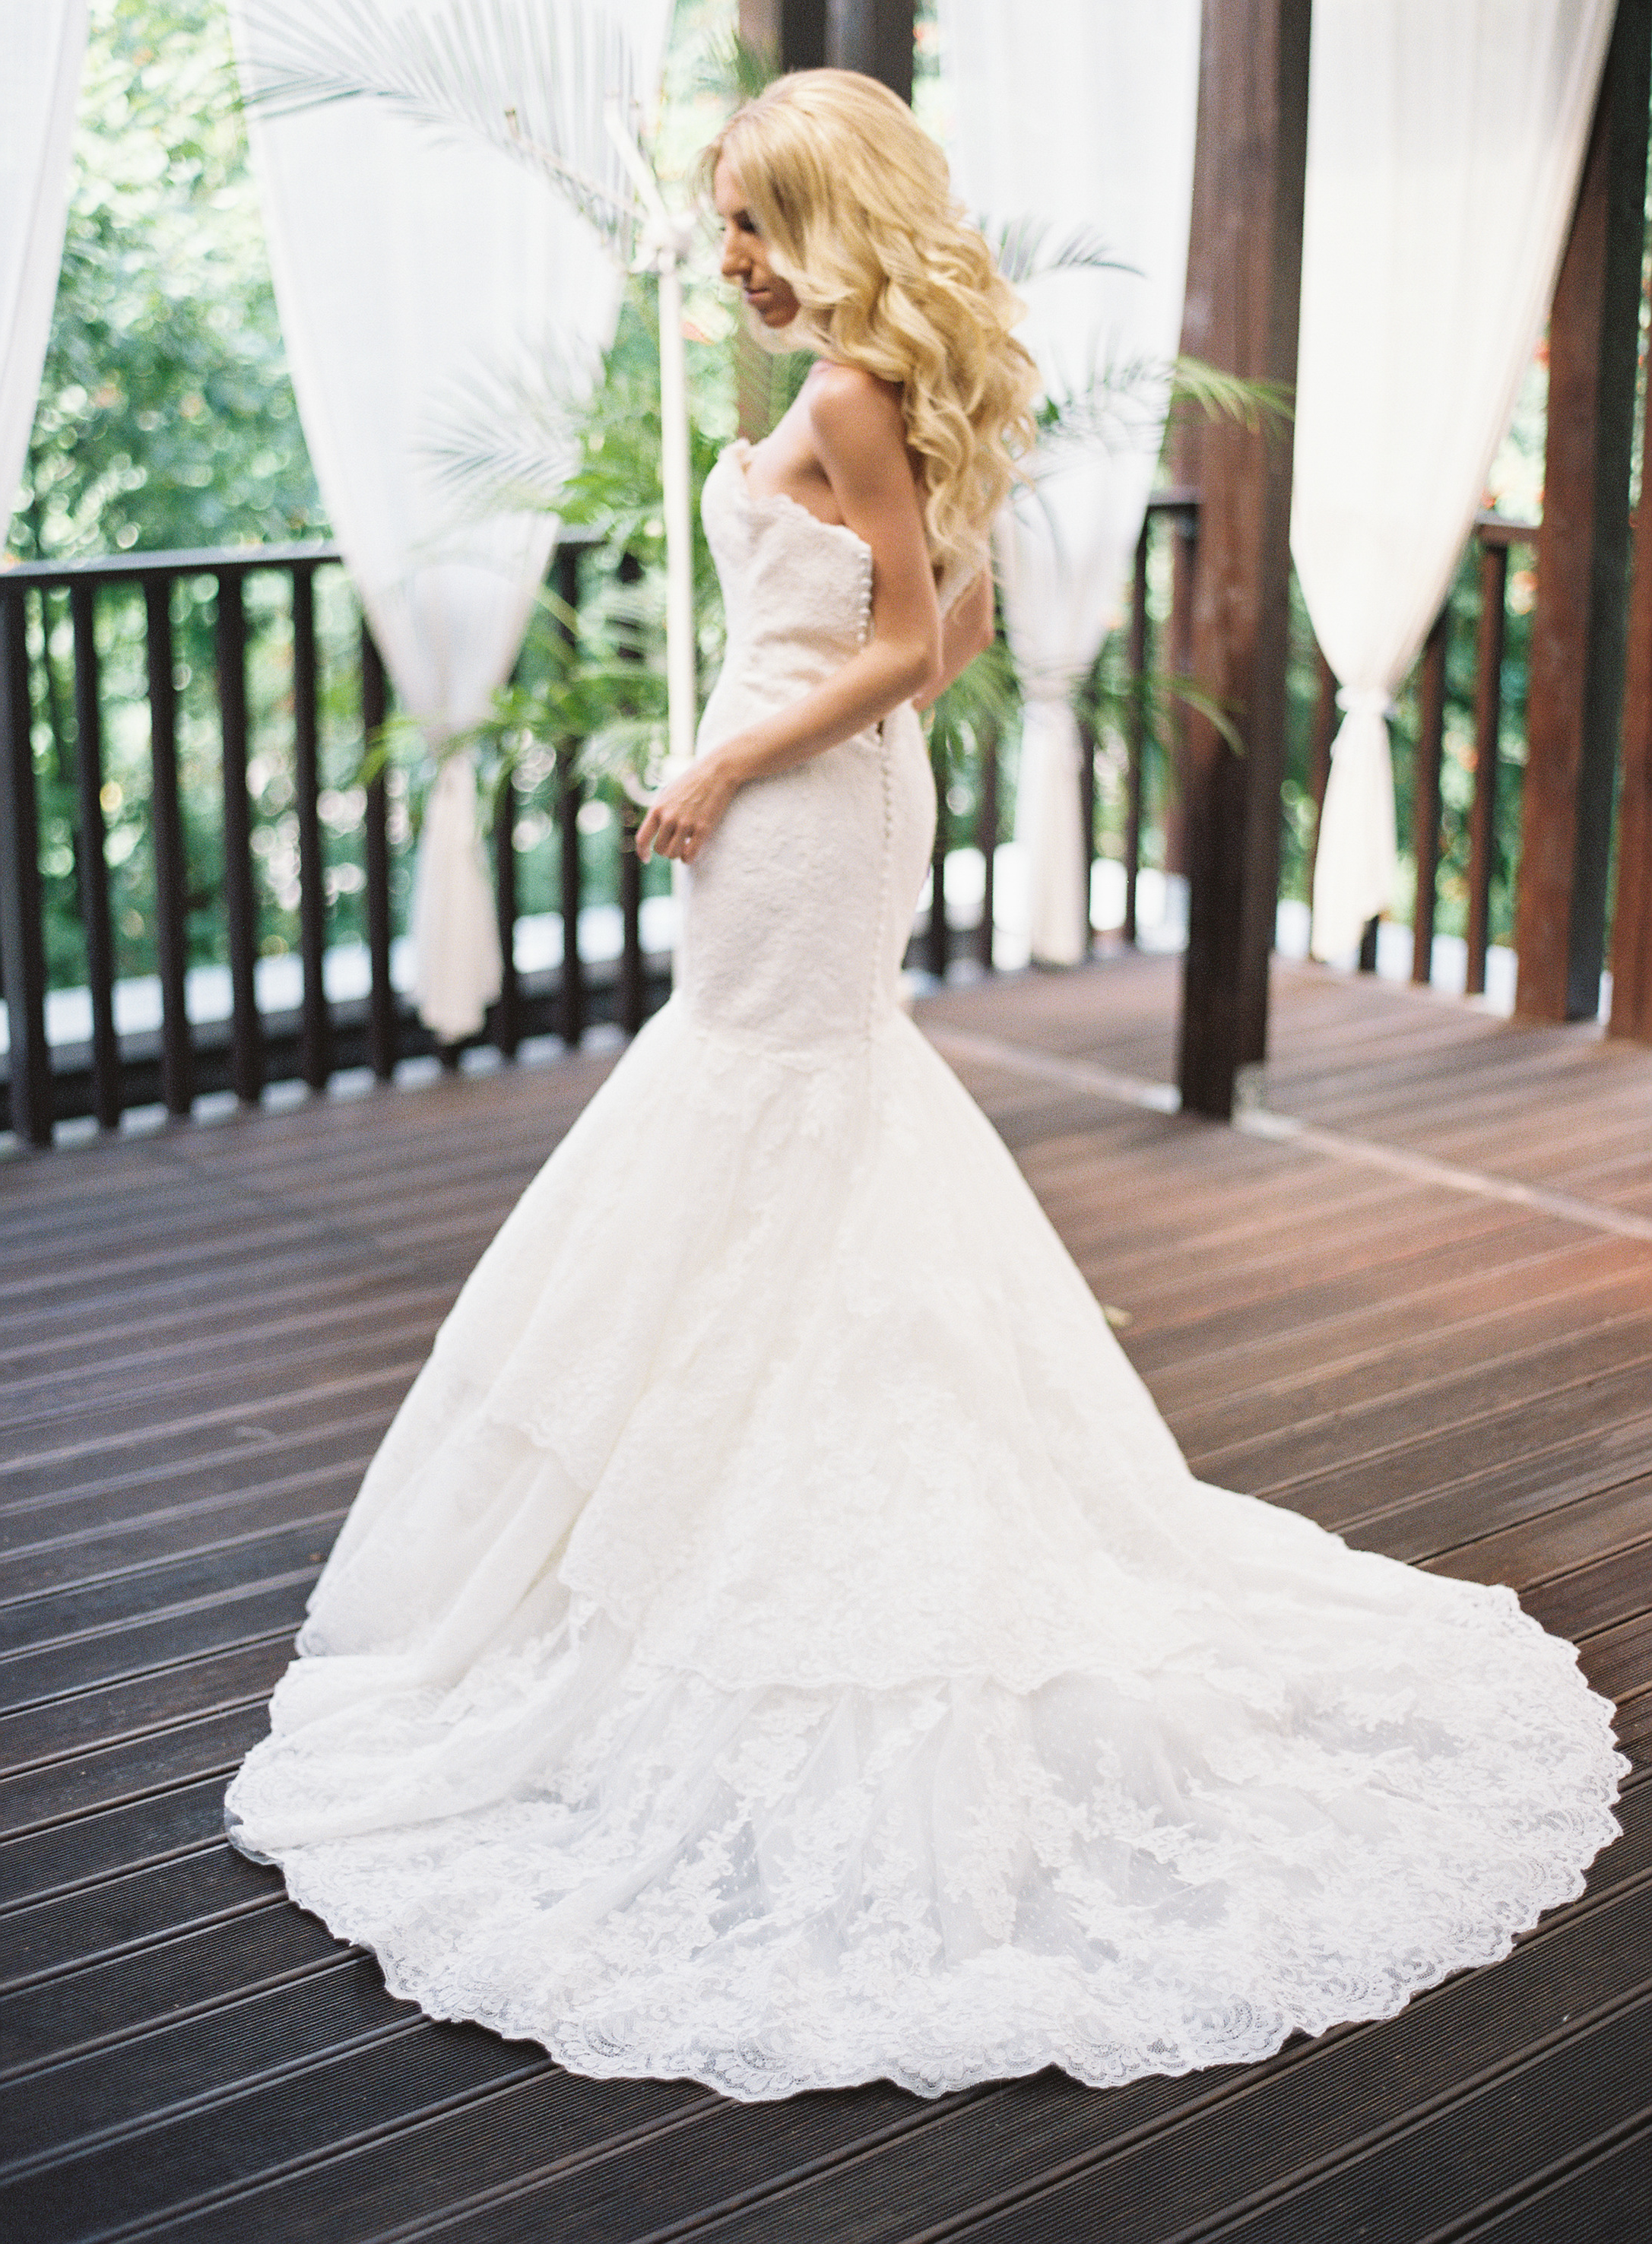 Wedding day-1-6.jpg